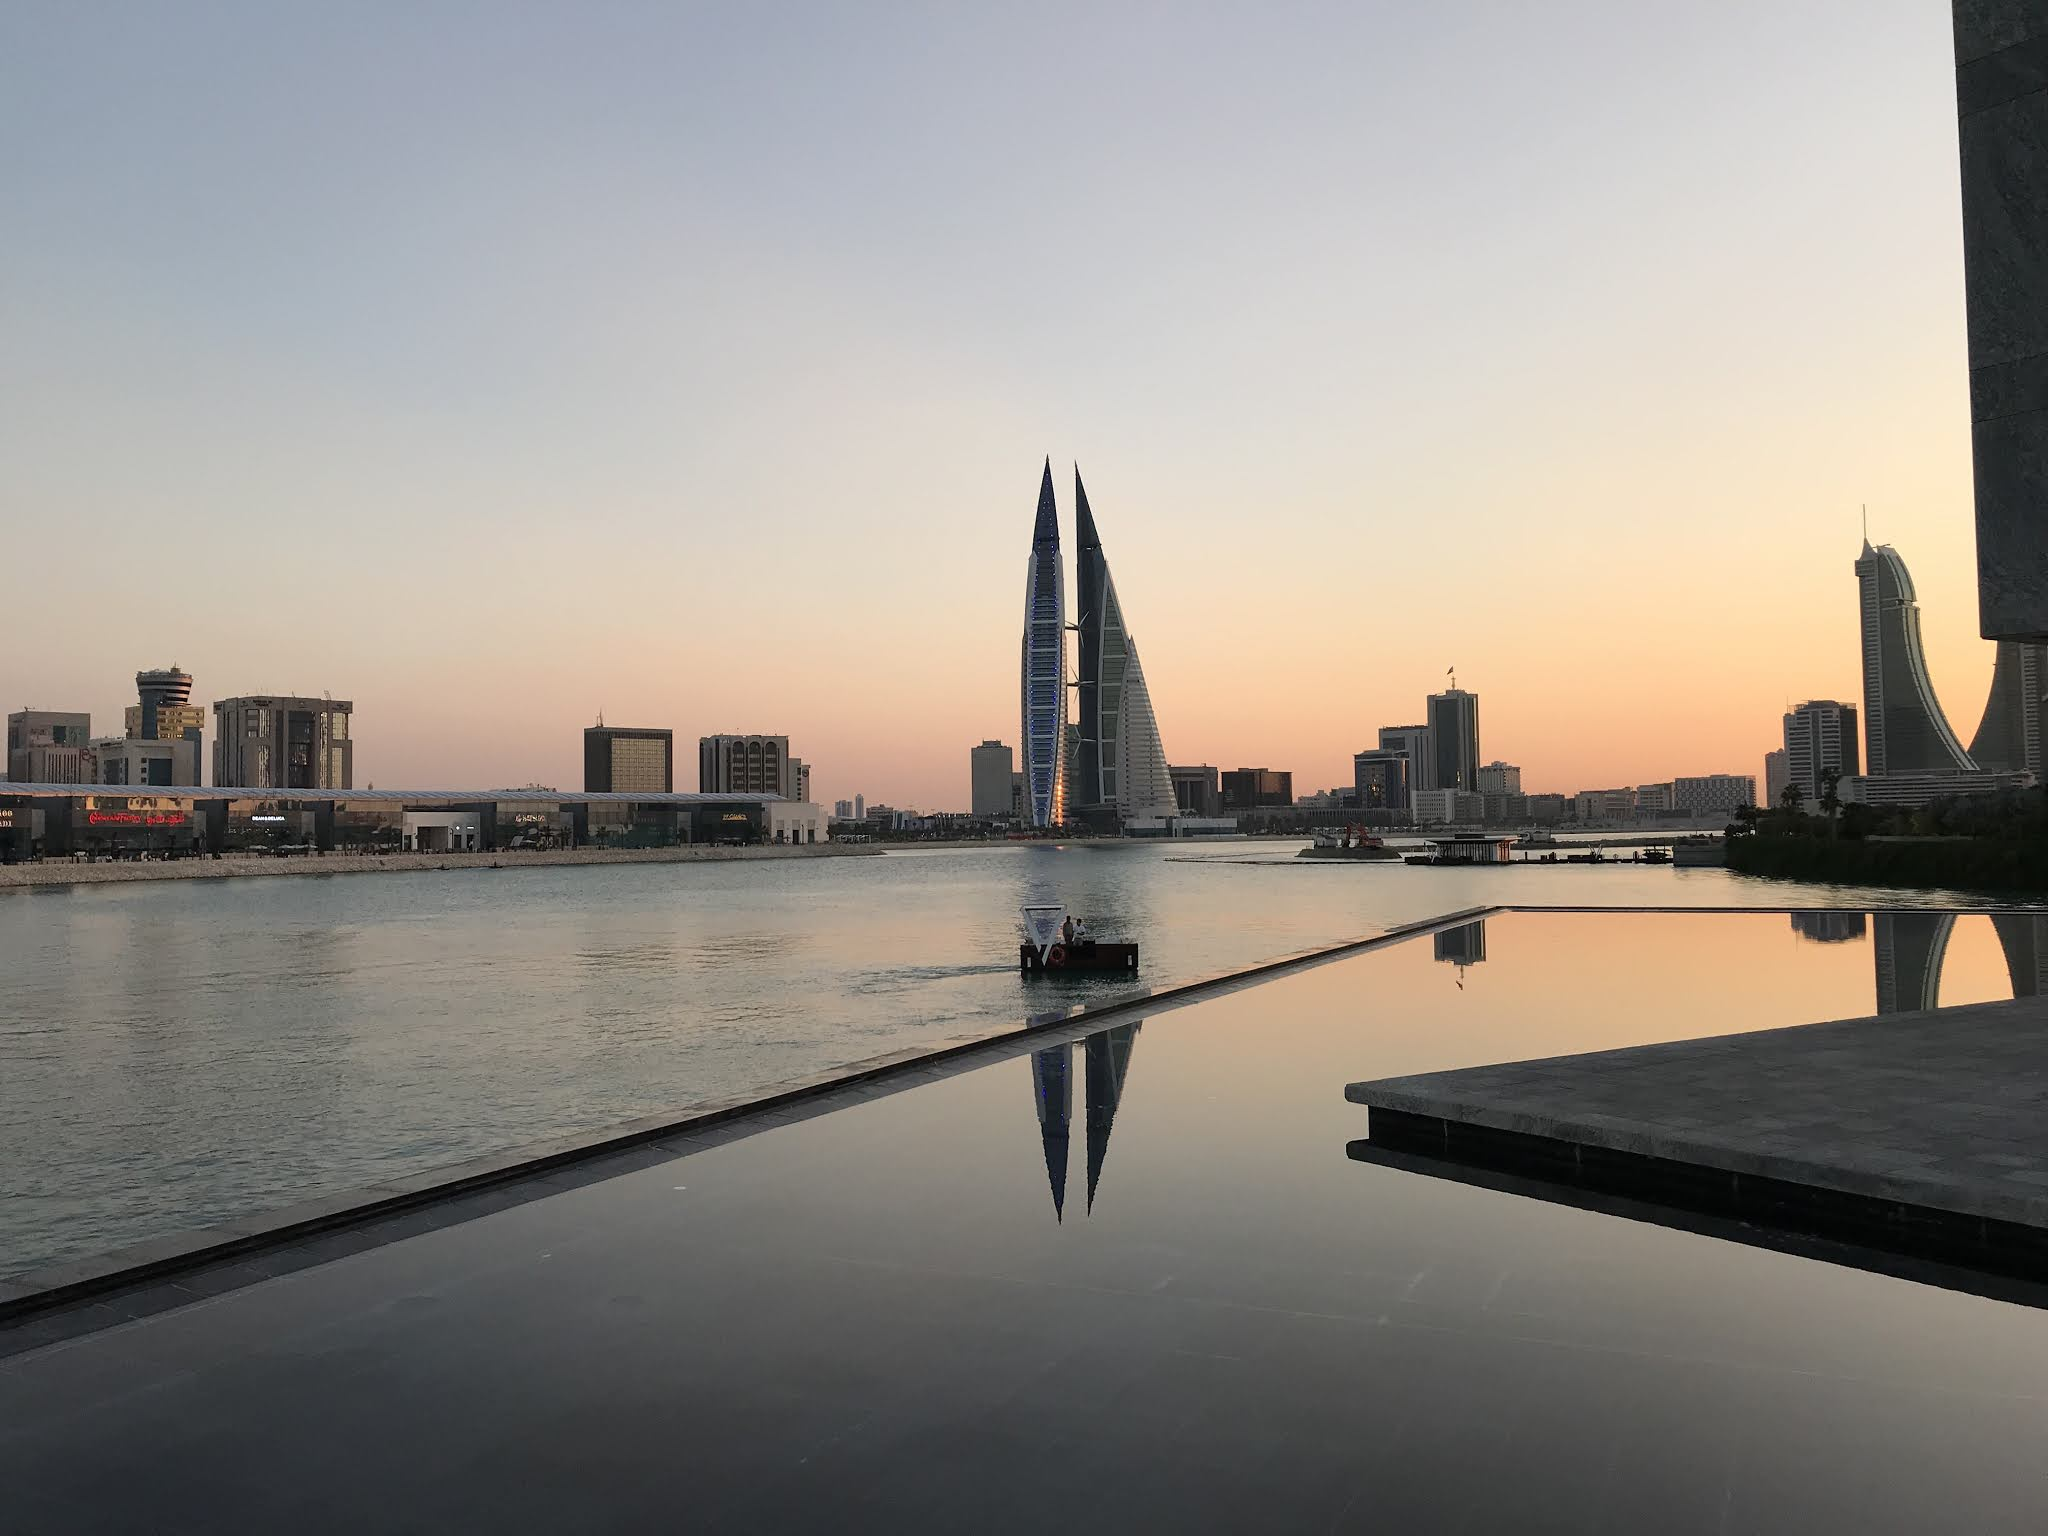 Bahrain awarded $1.6 billion worth of tenders in Q1 2021